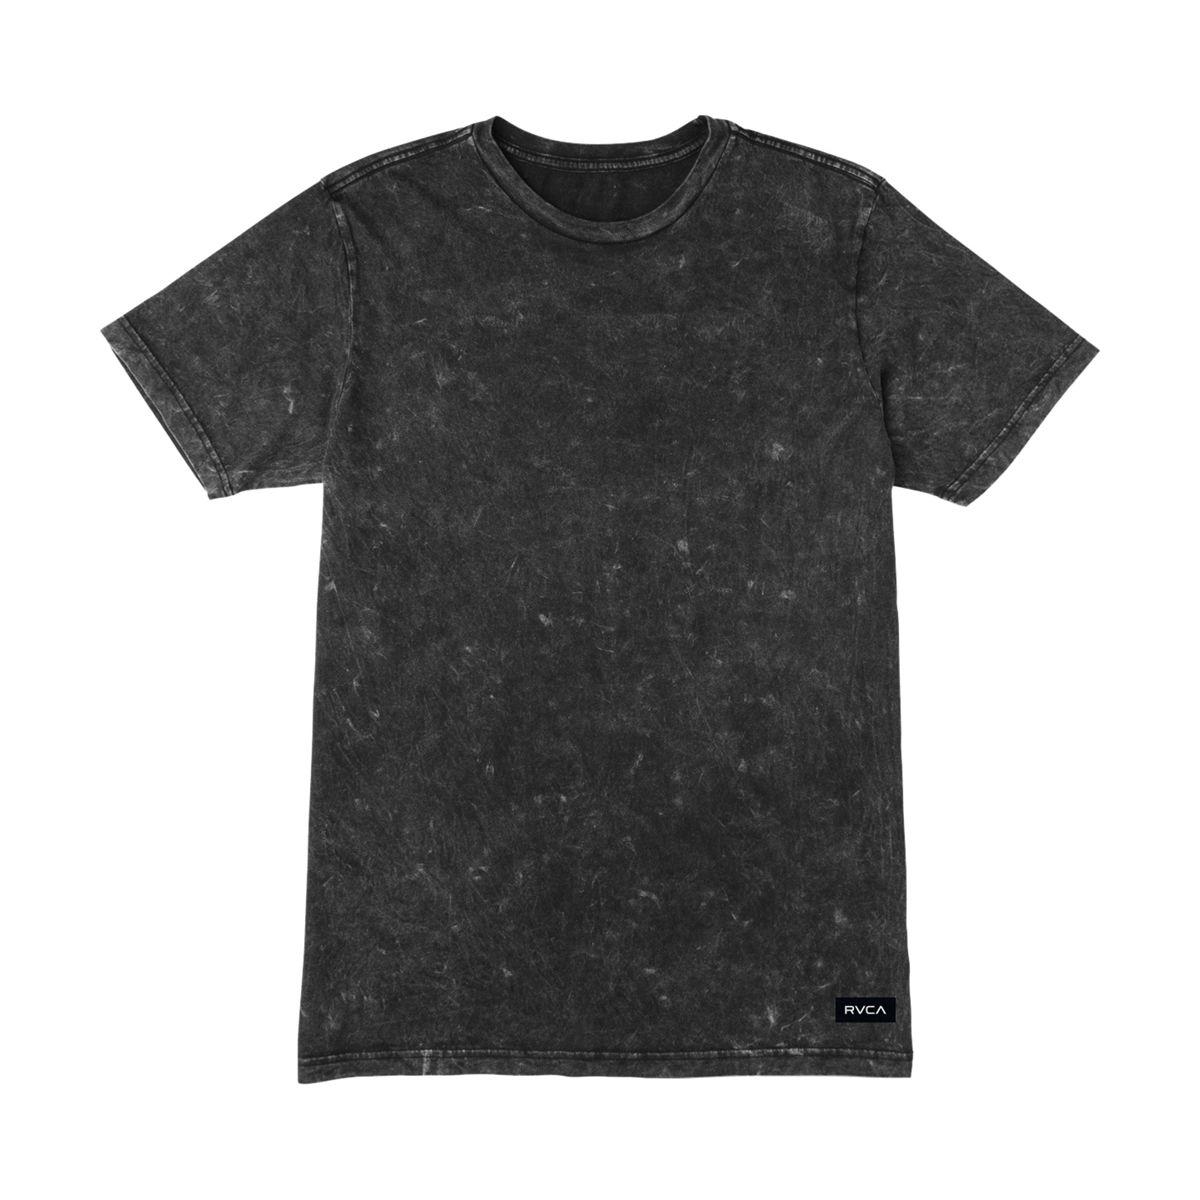 RVCA Label Mineral Wash T-Shirt - Short-Sleeve - Men